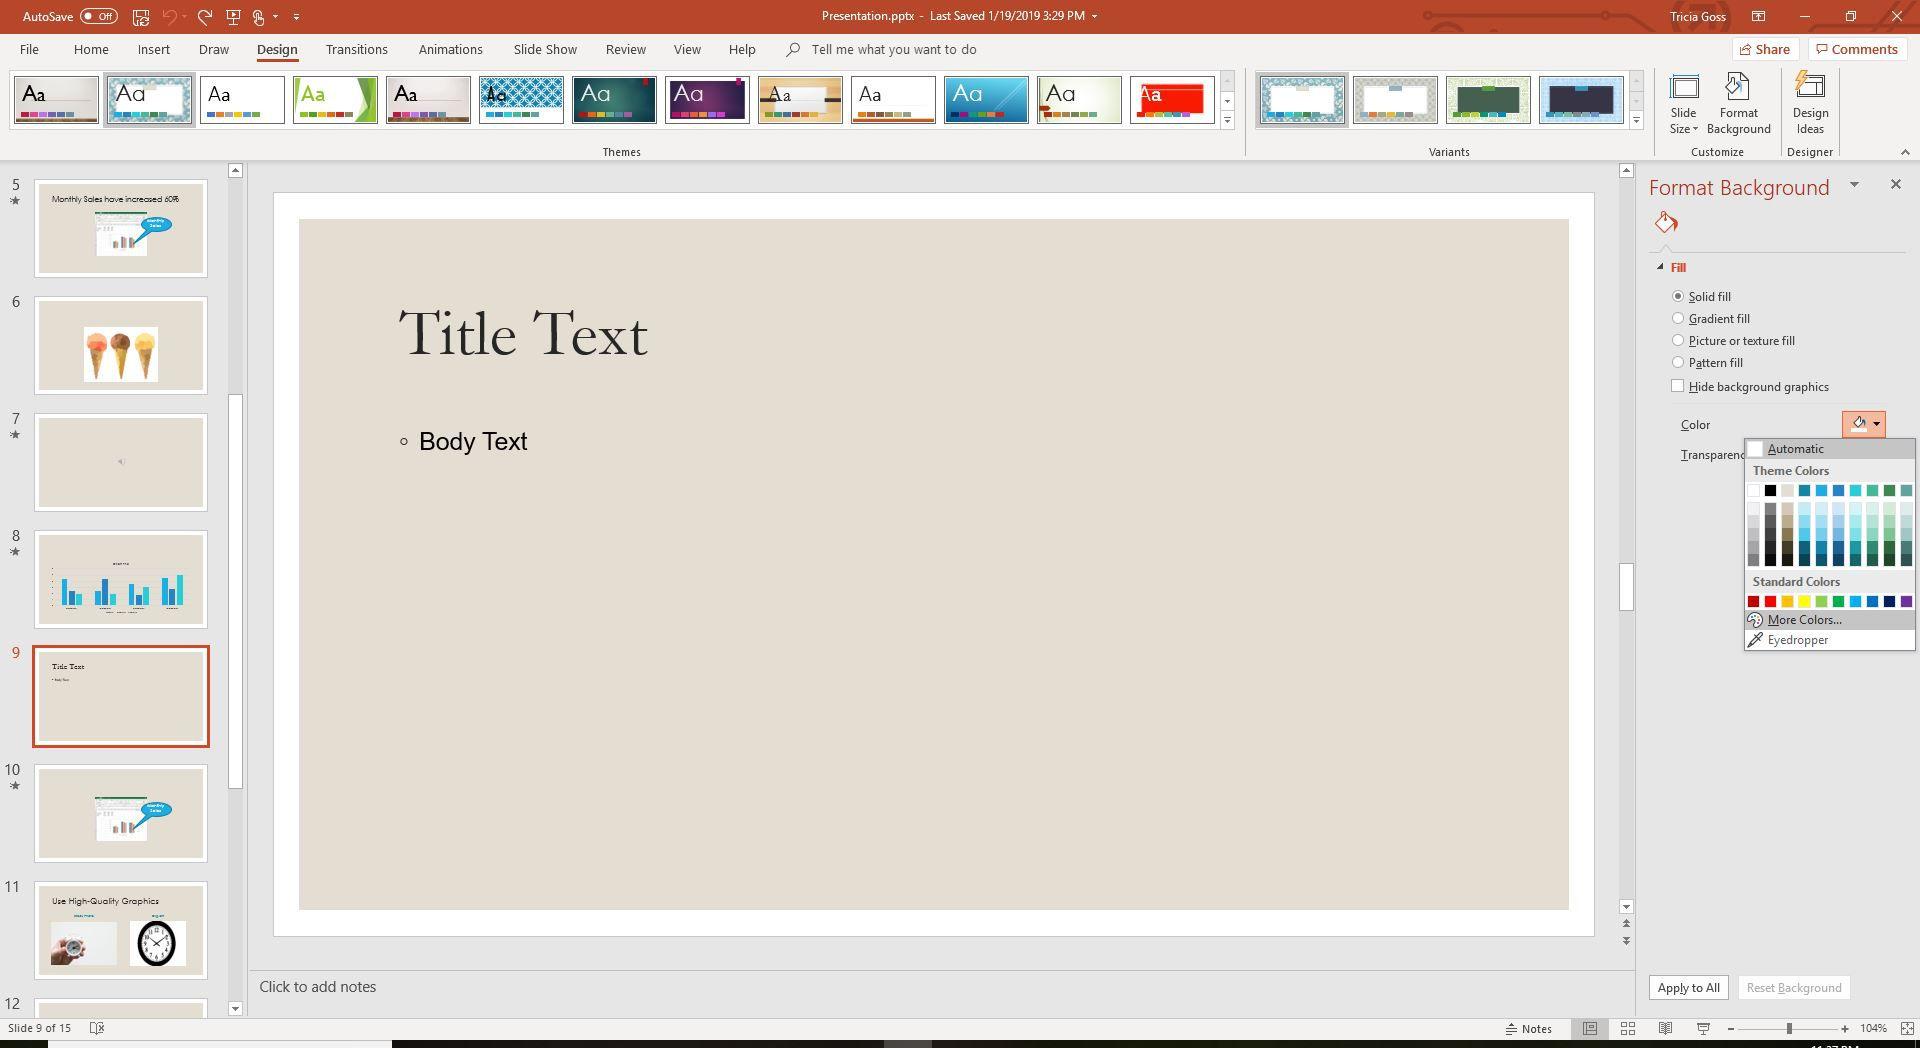 Format Background menu in PowerPoint